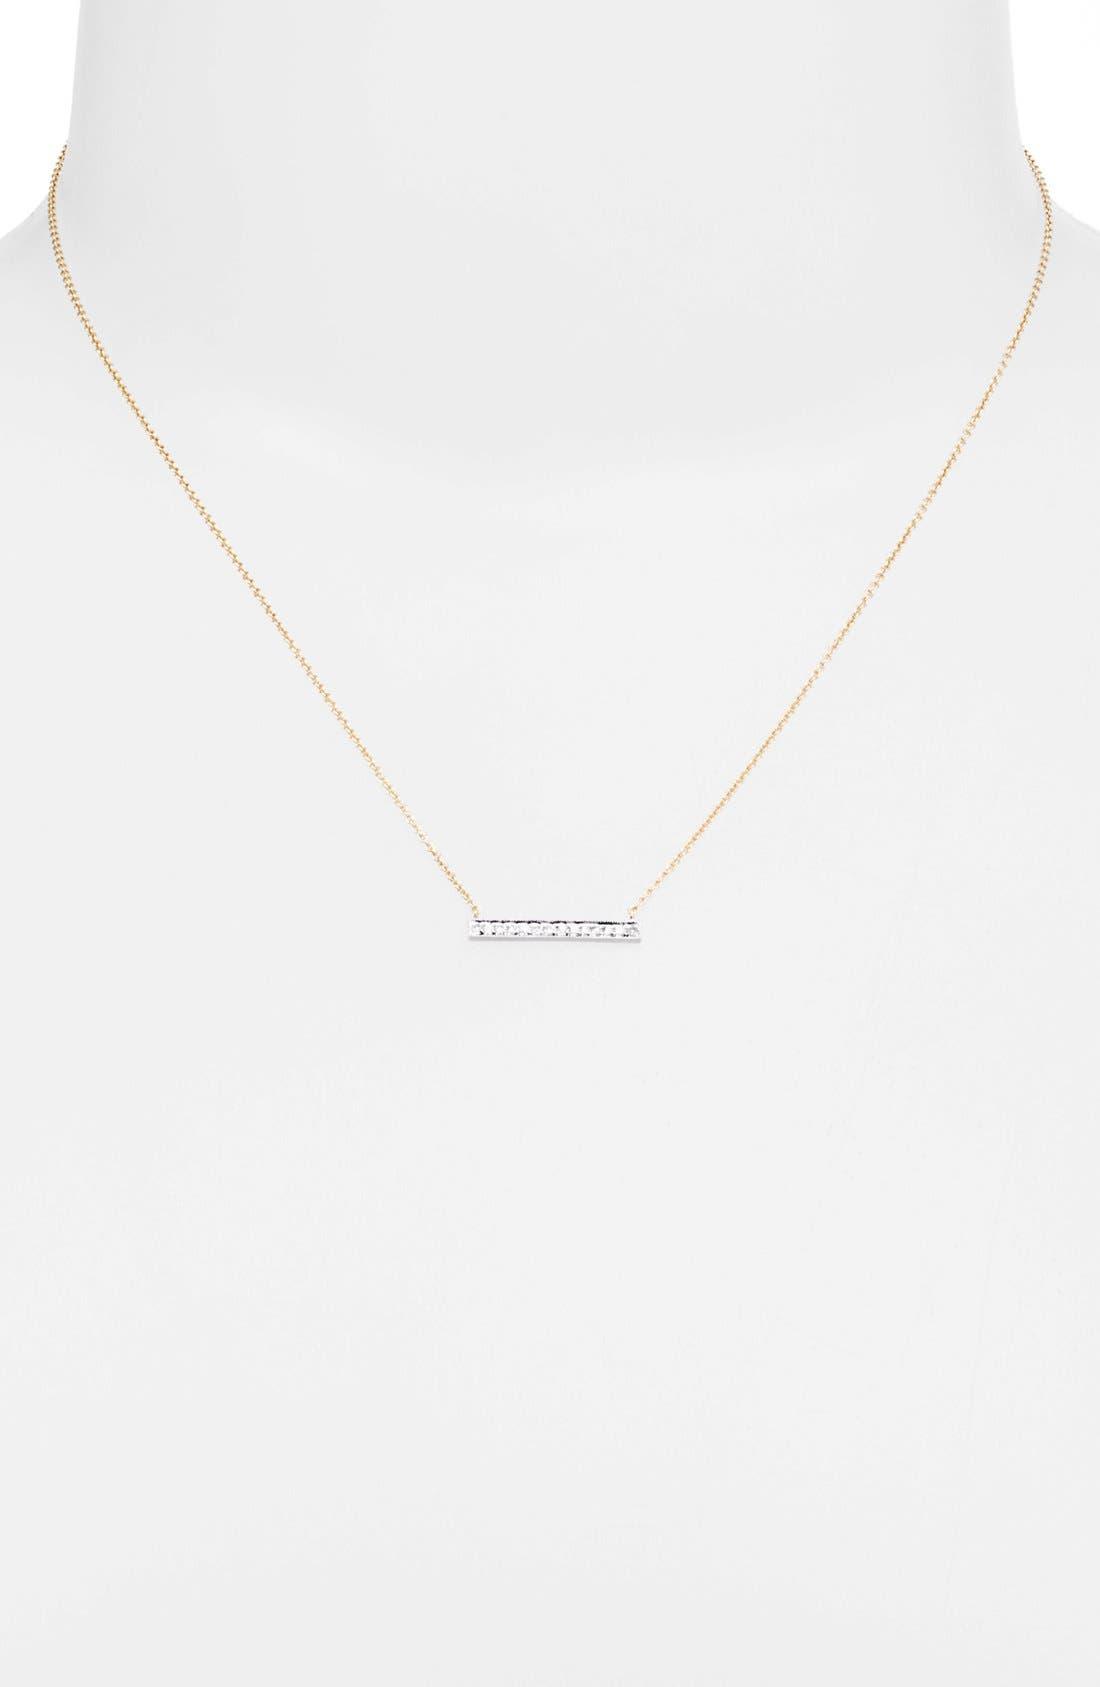 DANA REBECCA DESIGNS, 'Sylvie Rose' Medium Diamond Bar Pendant Necklace, Alternate thumbnail 2, color, YELLOW GOLD